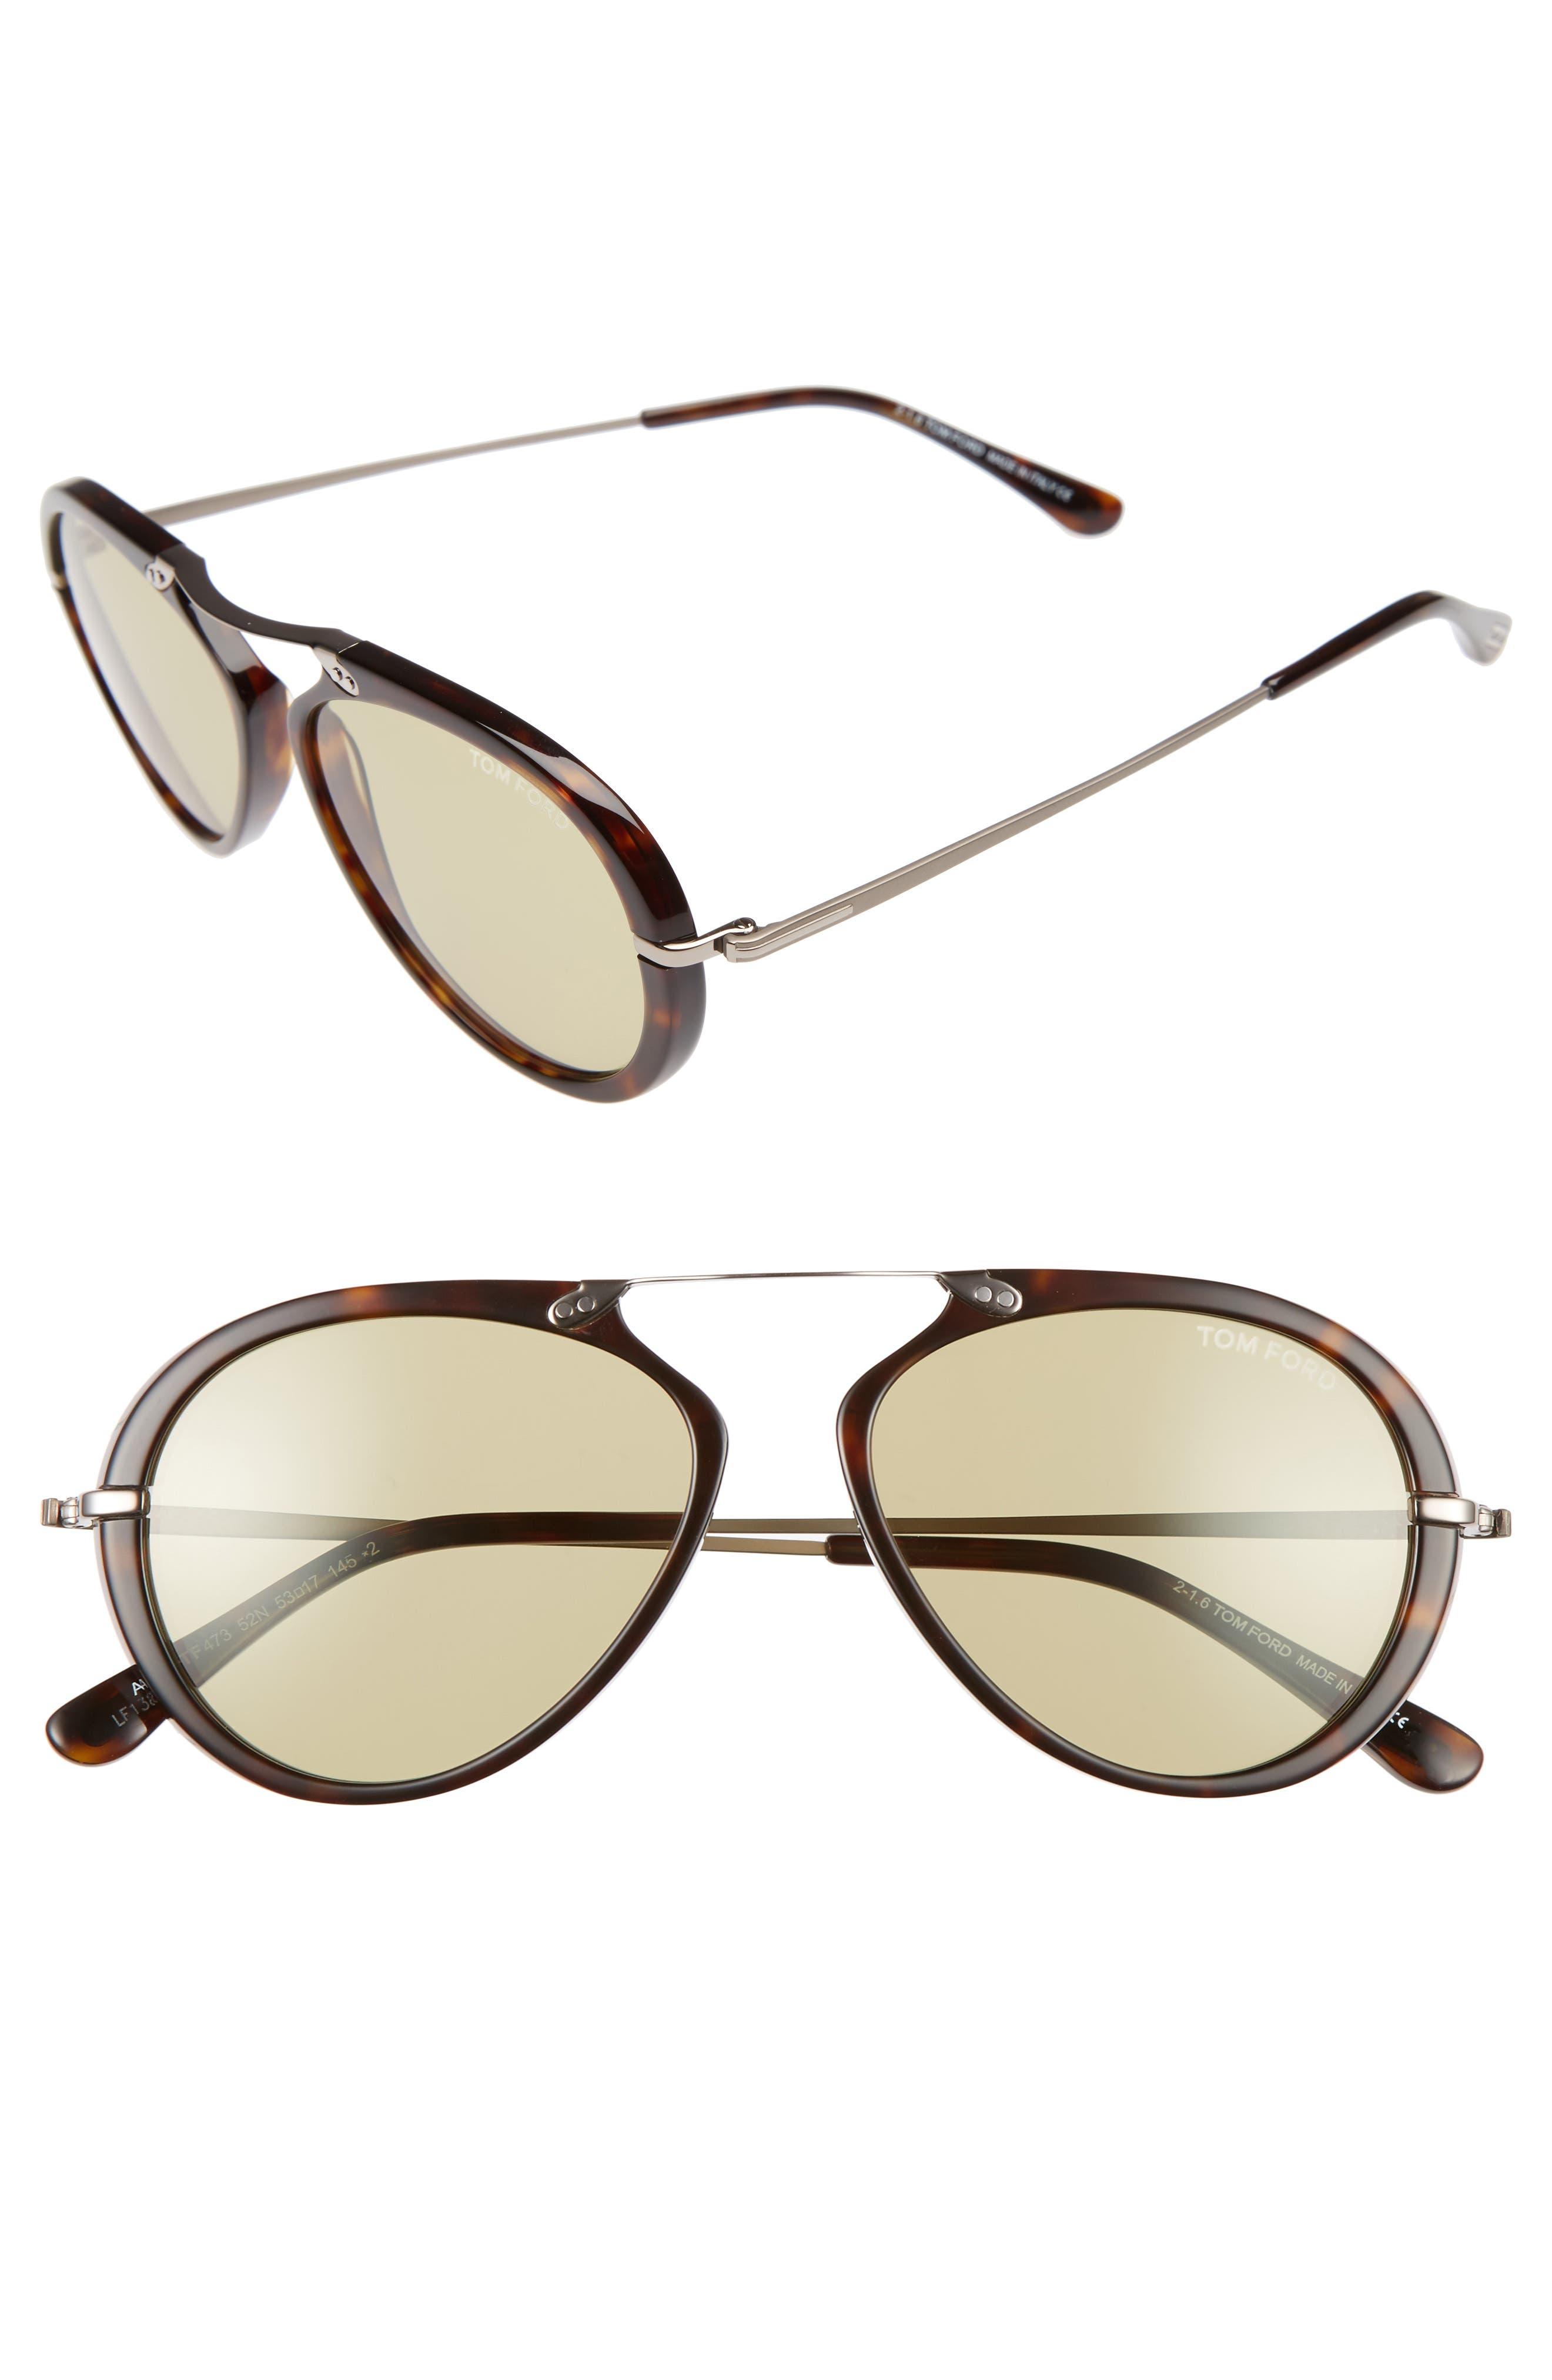 Main Image - Tom Ford 'Aaron' 53mm Sunglasses